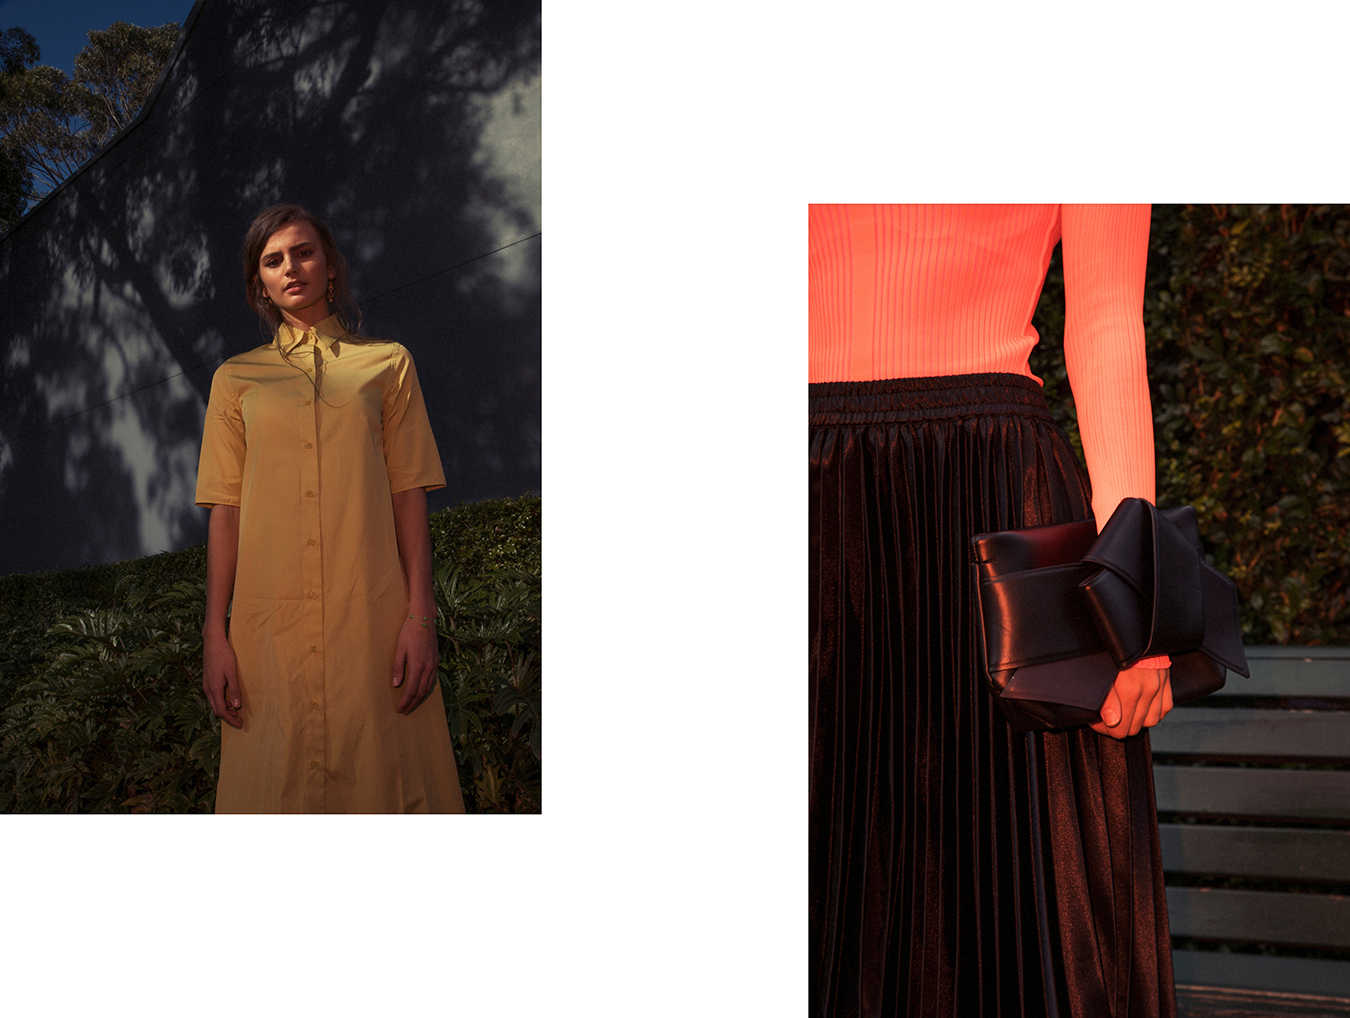 Left: Jac + Jack dress / Right: Acne clutch bag